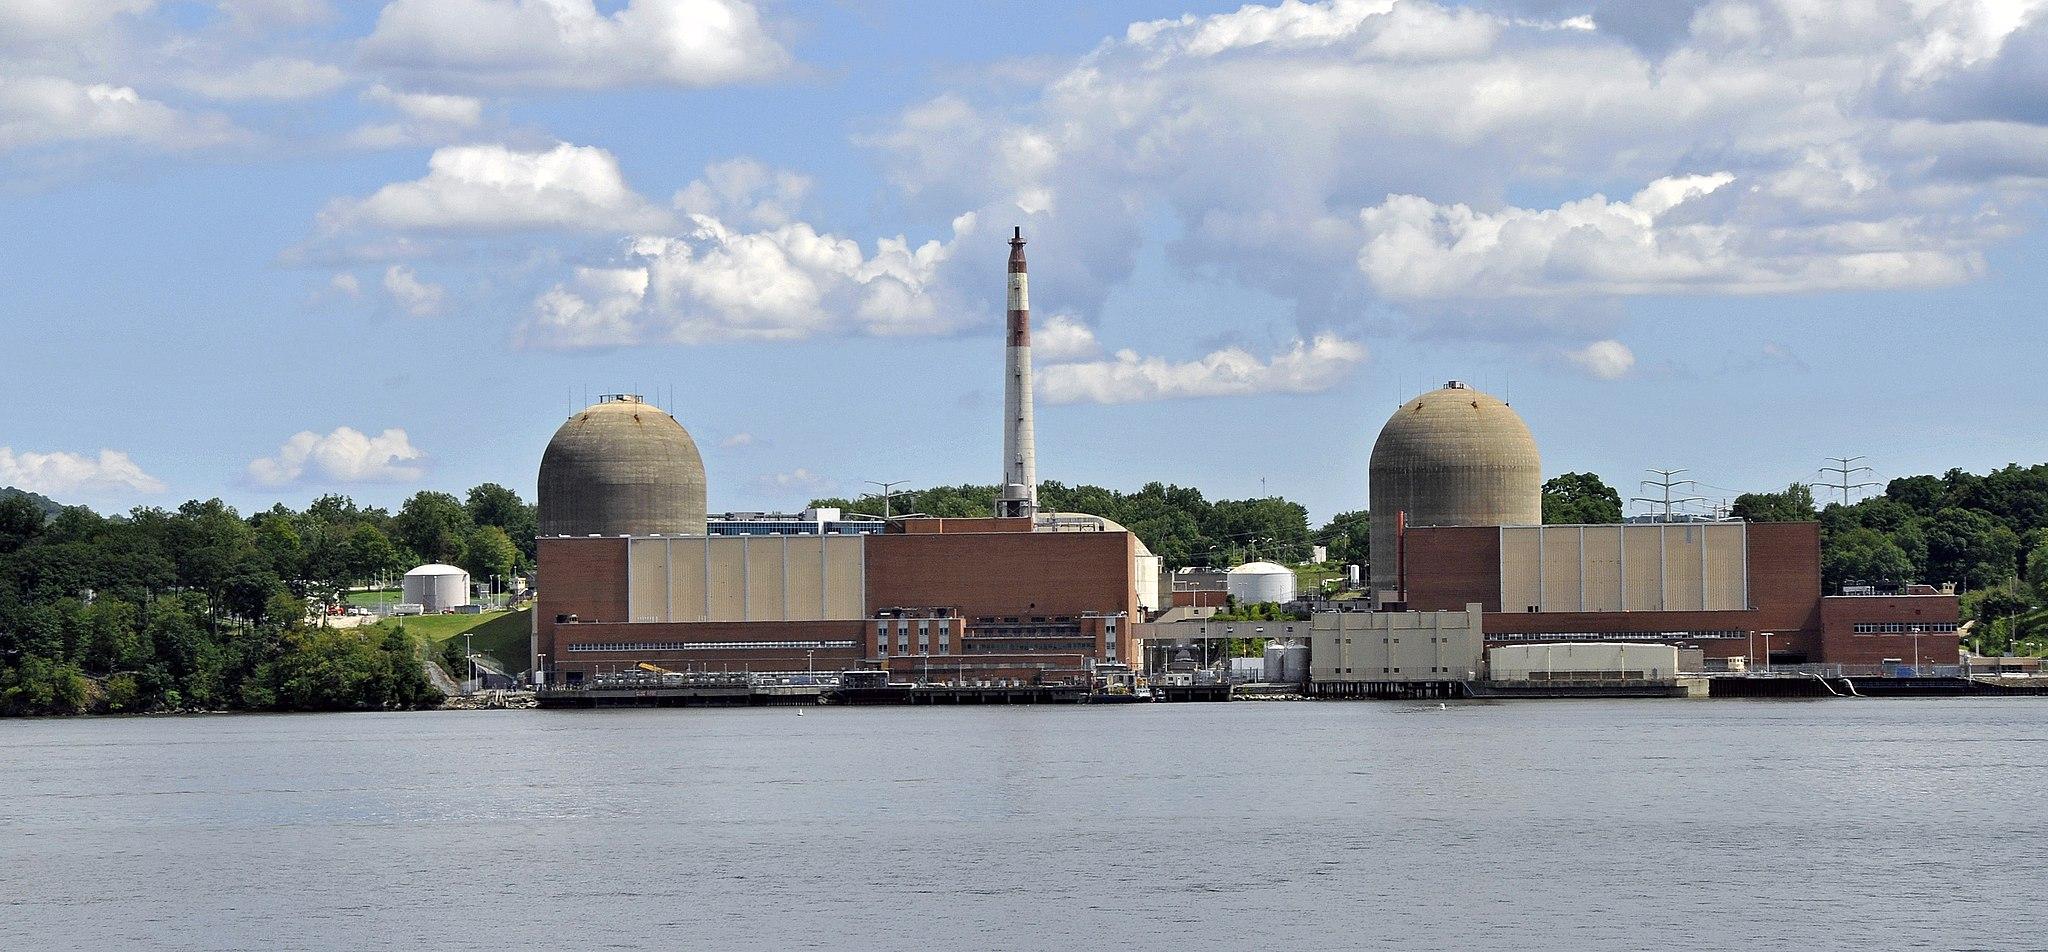 Indian Point tuumajaam. Pildistas Tony CC BY 2.0 creativecommons.org, via Wikimedia Commons